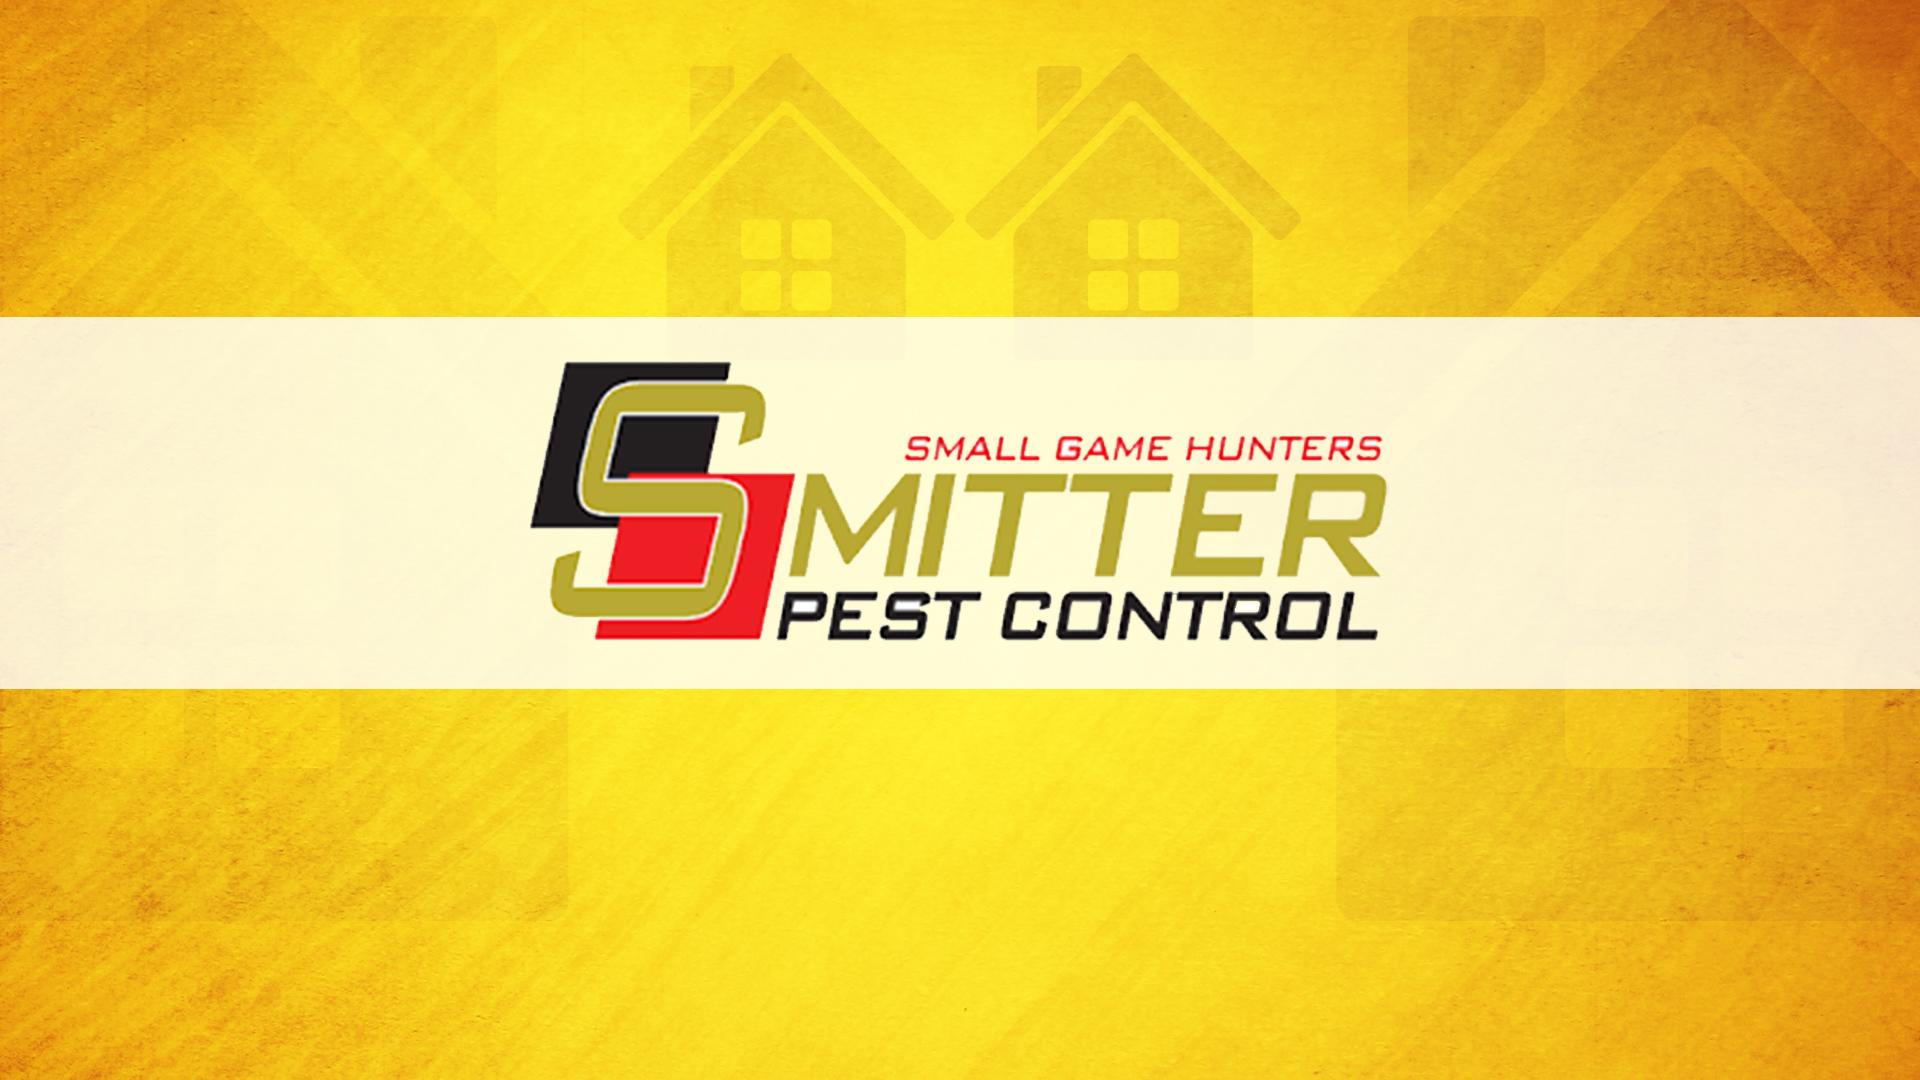 Smitter Pest Control